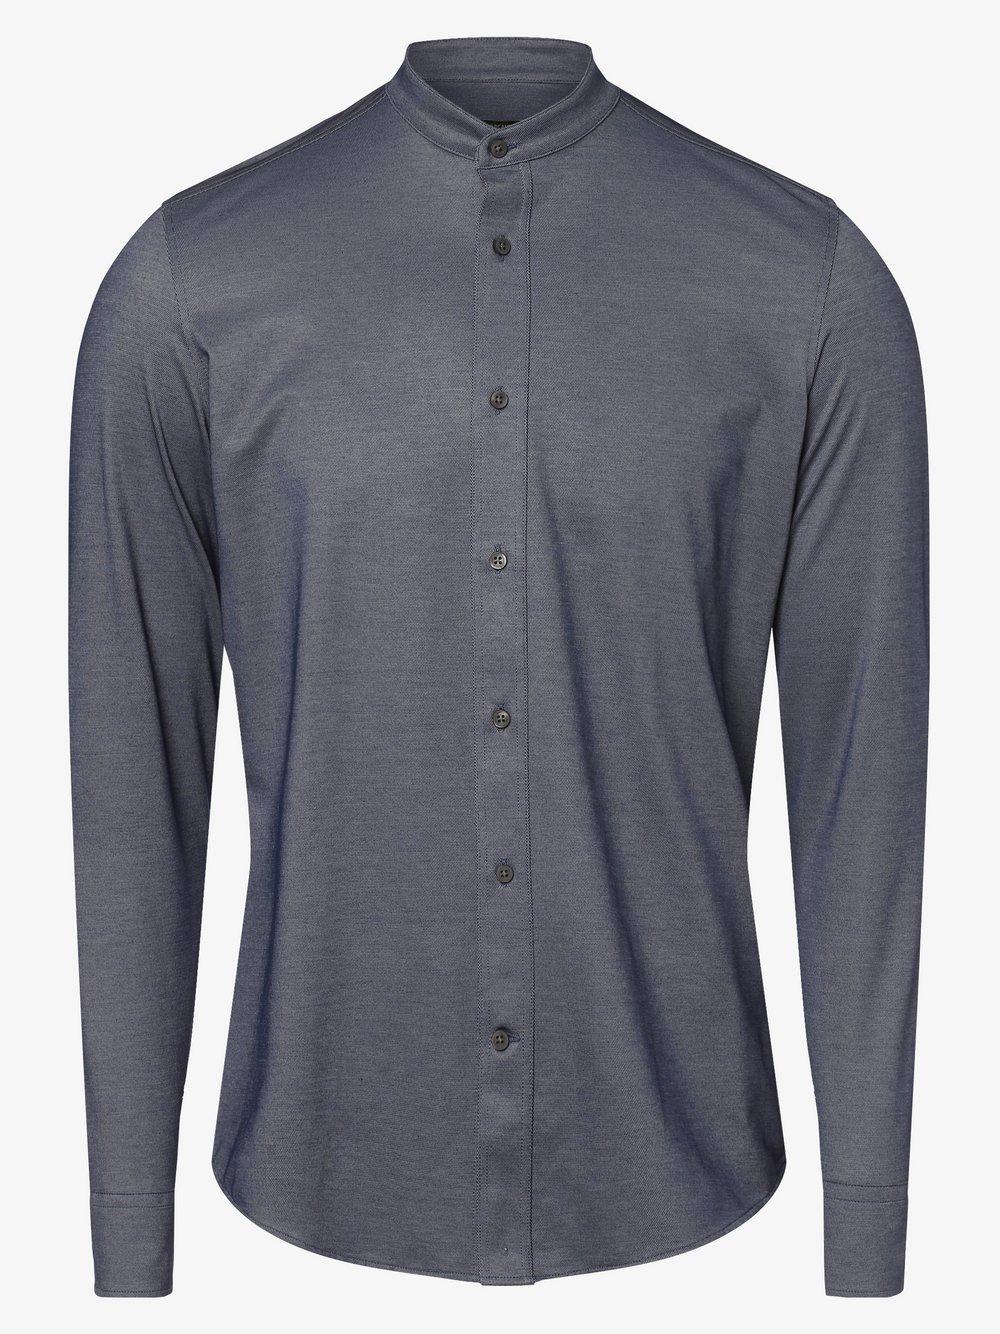 Drykorn - Koszula męska – Tarok, niebieski